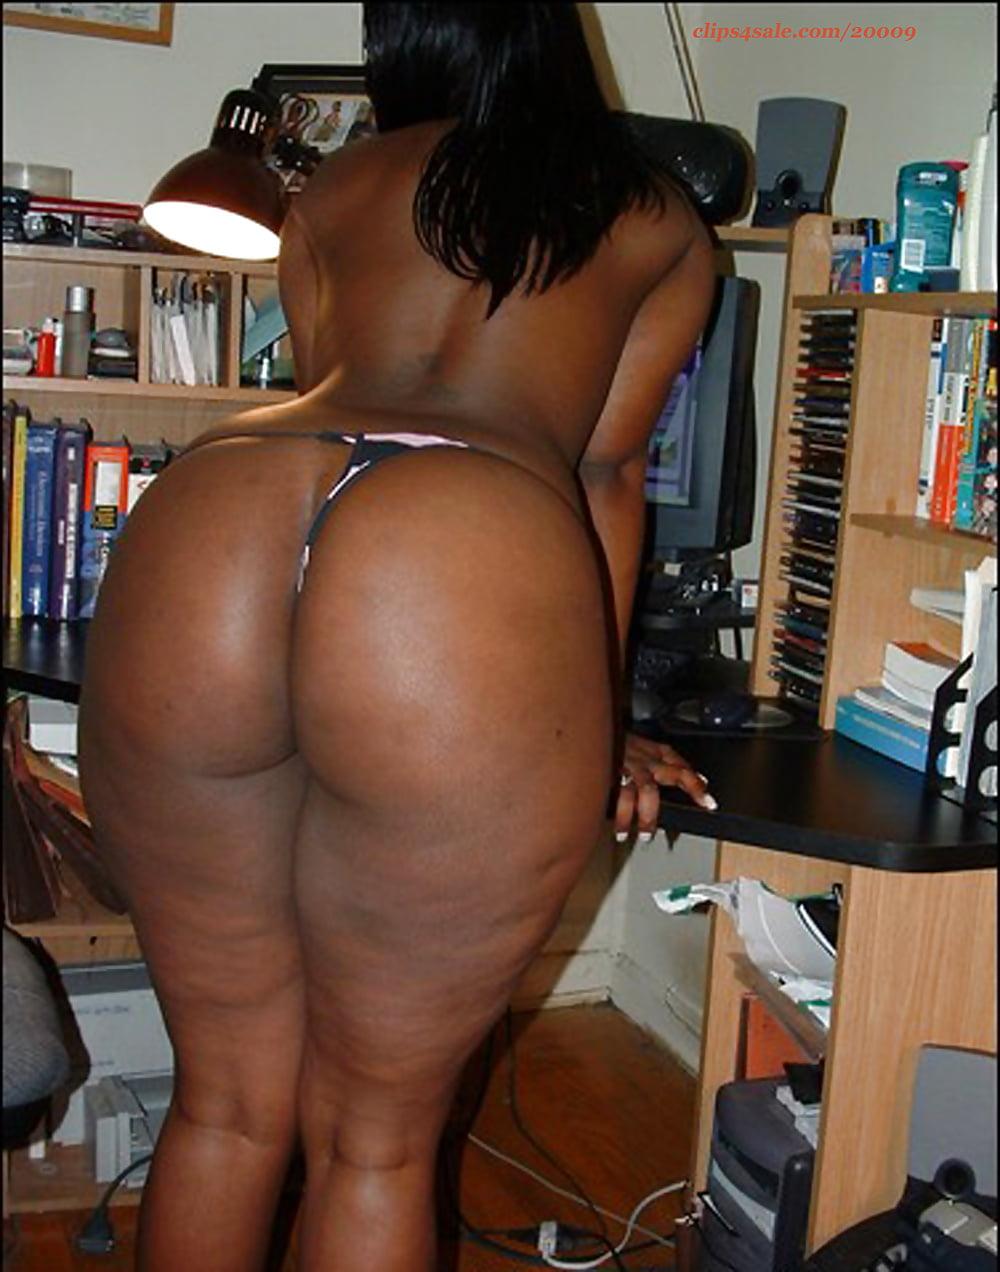 Black on black with big booty ebony milf mom in sexy eyeglasses